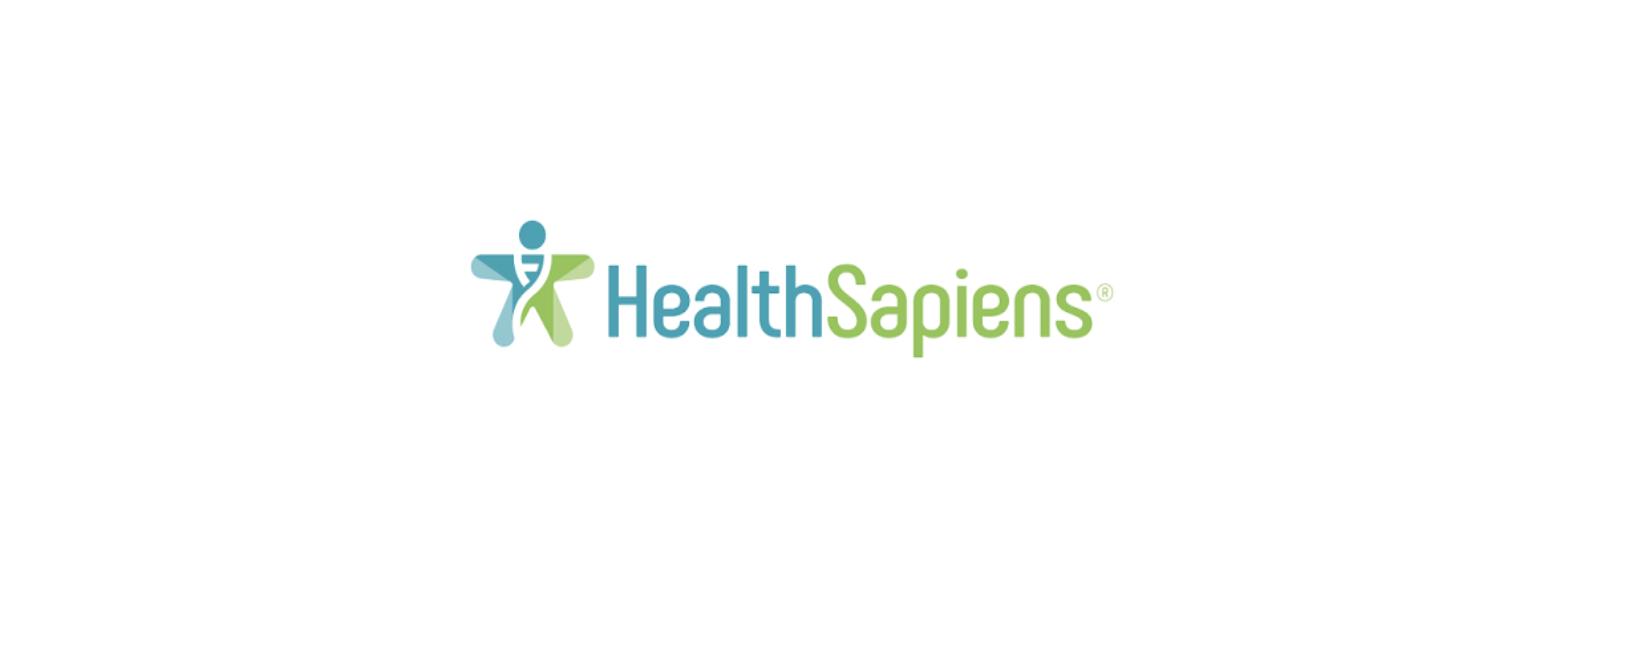 Health Sapiens Discount Code 2021